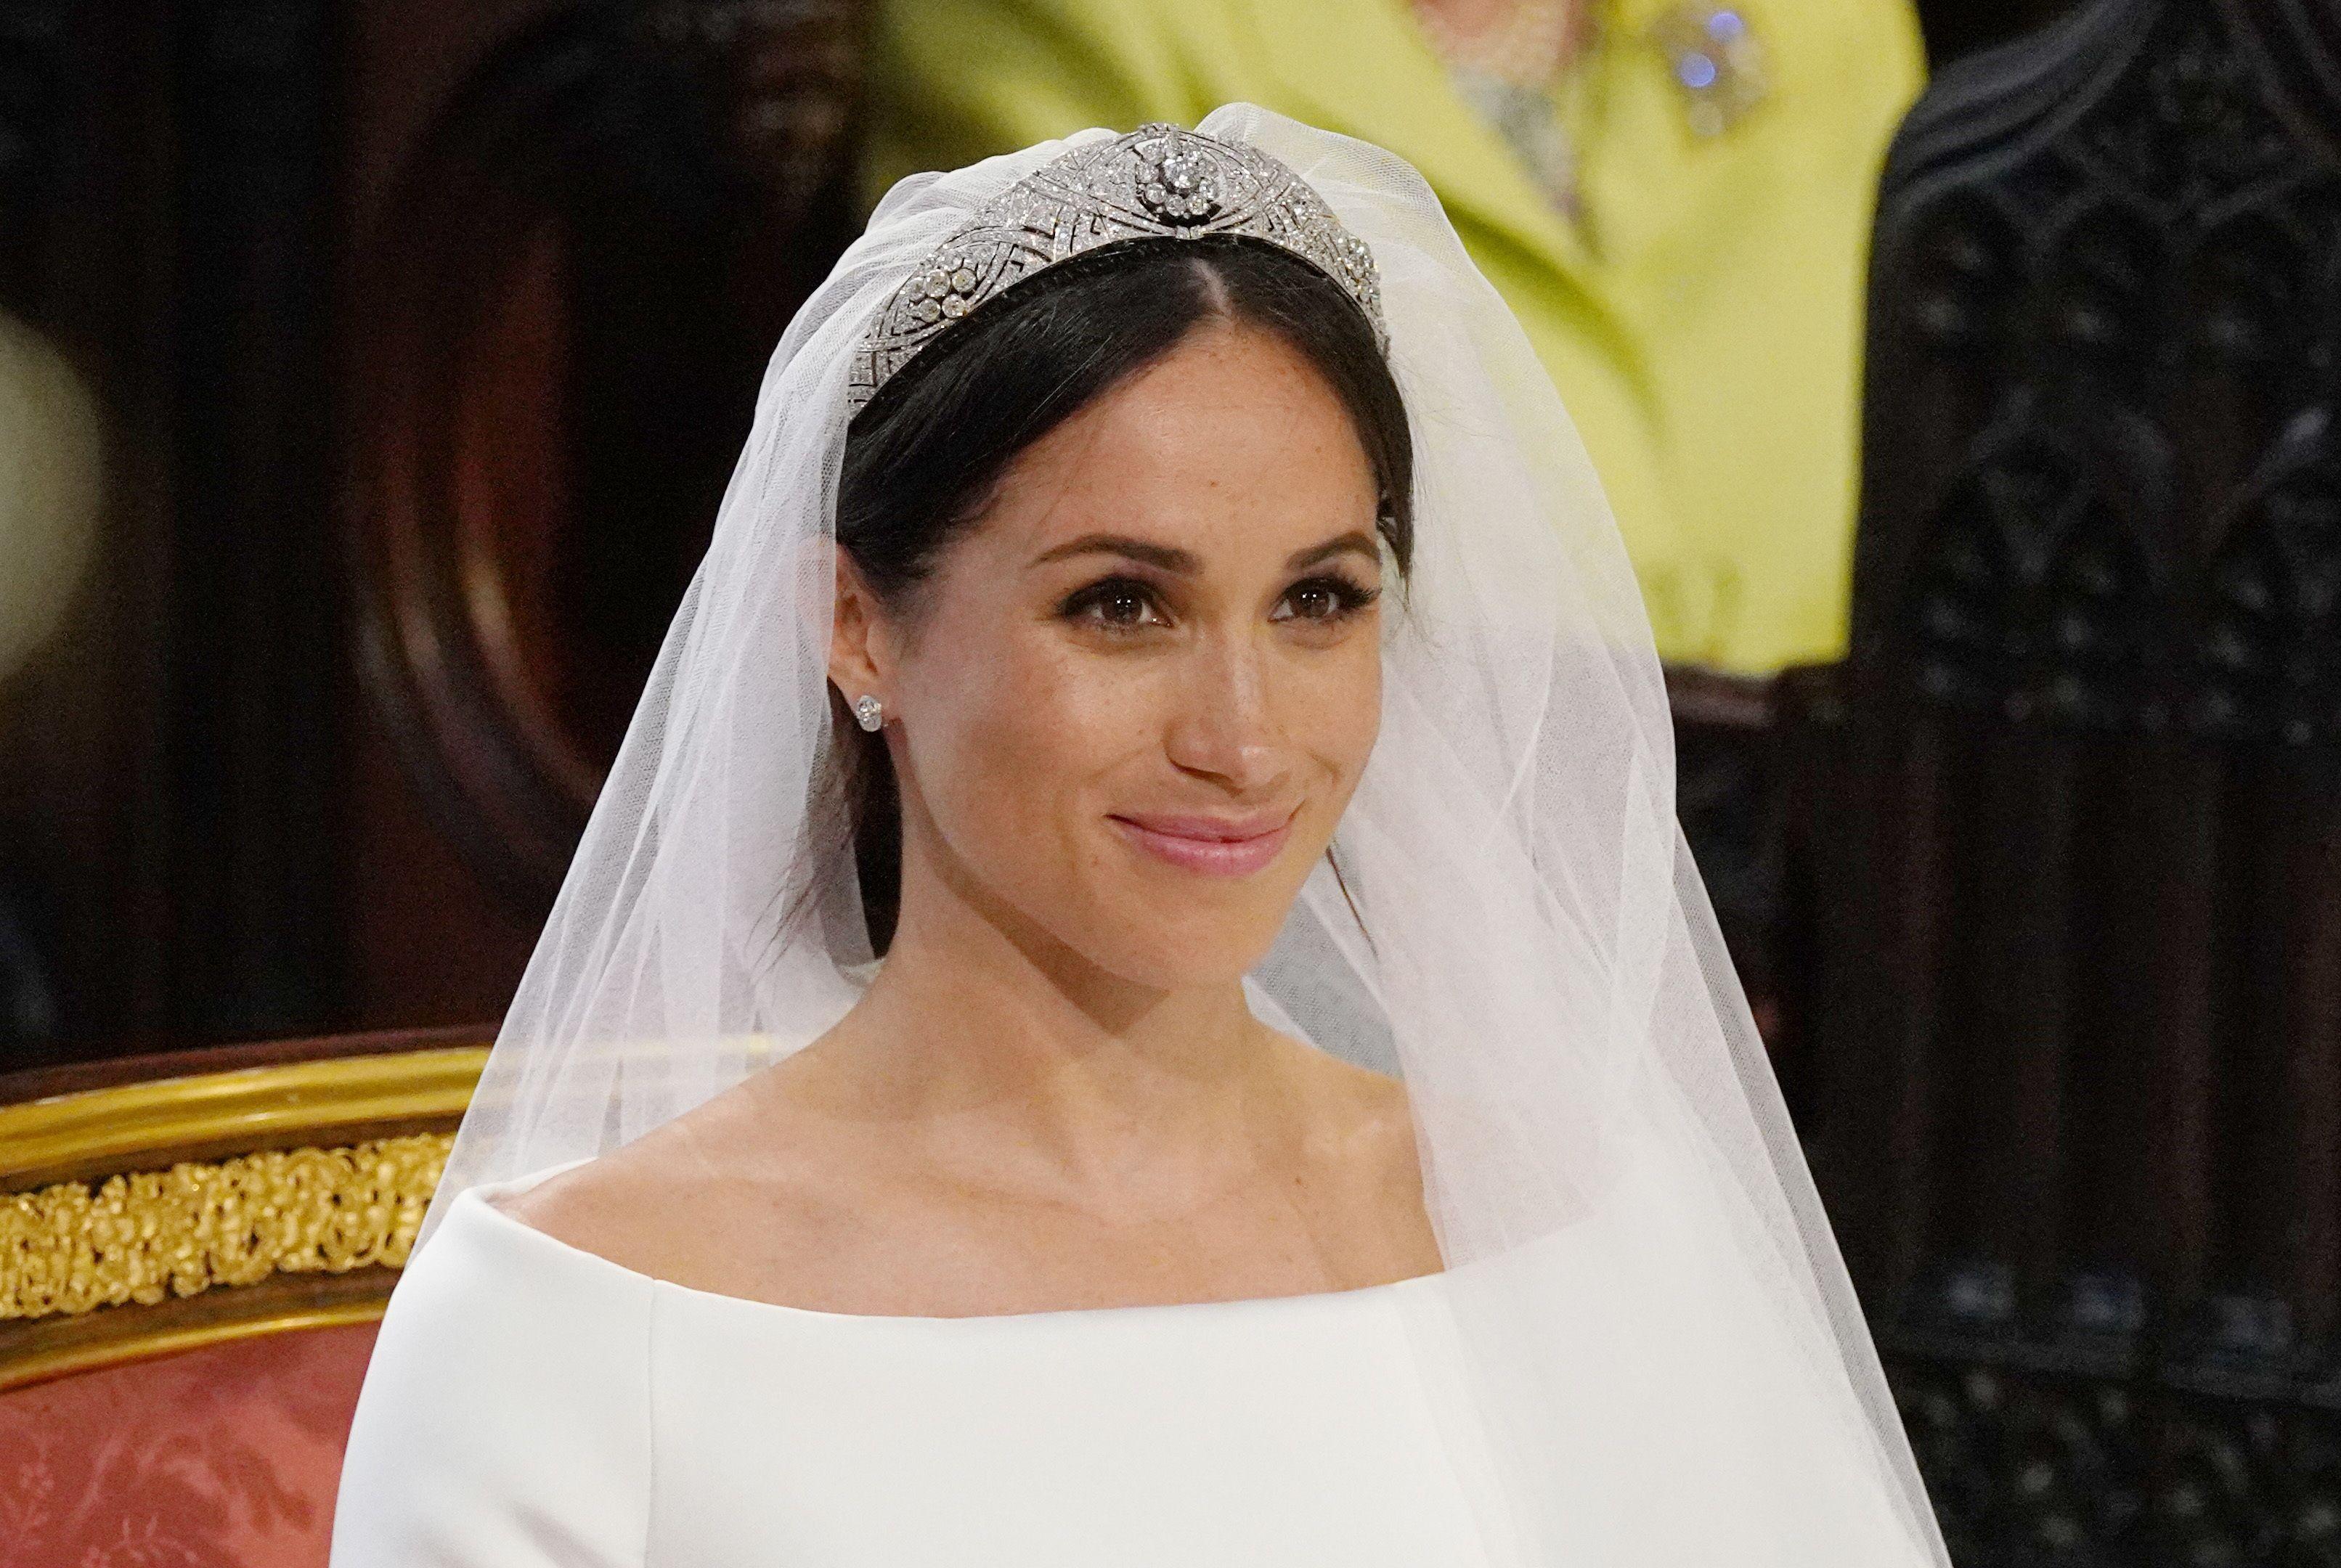 the queen found meghan markle s wedding dress questionable the queen found meghan markle s wedding